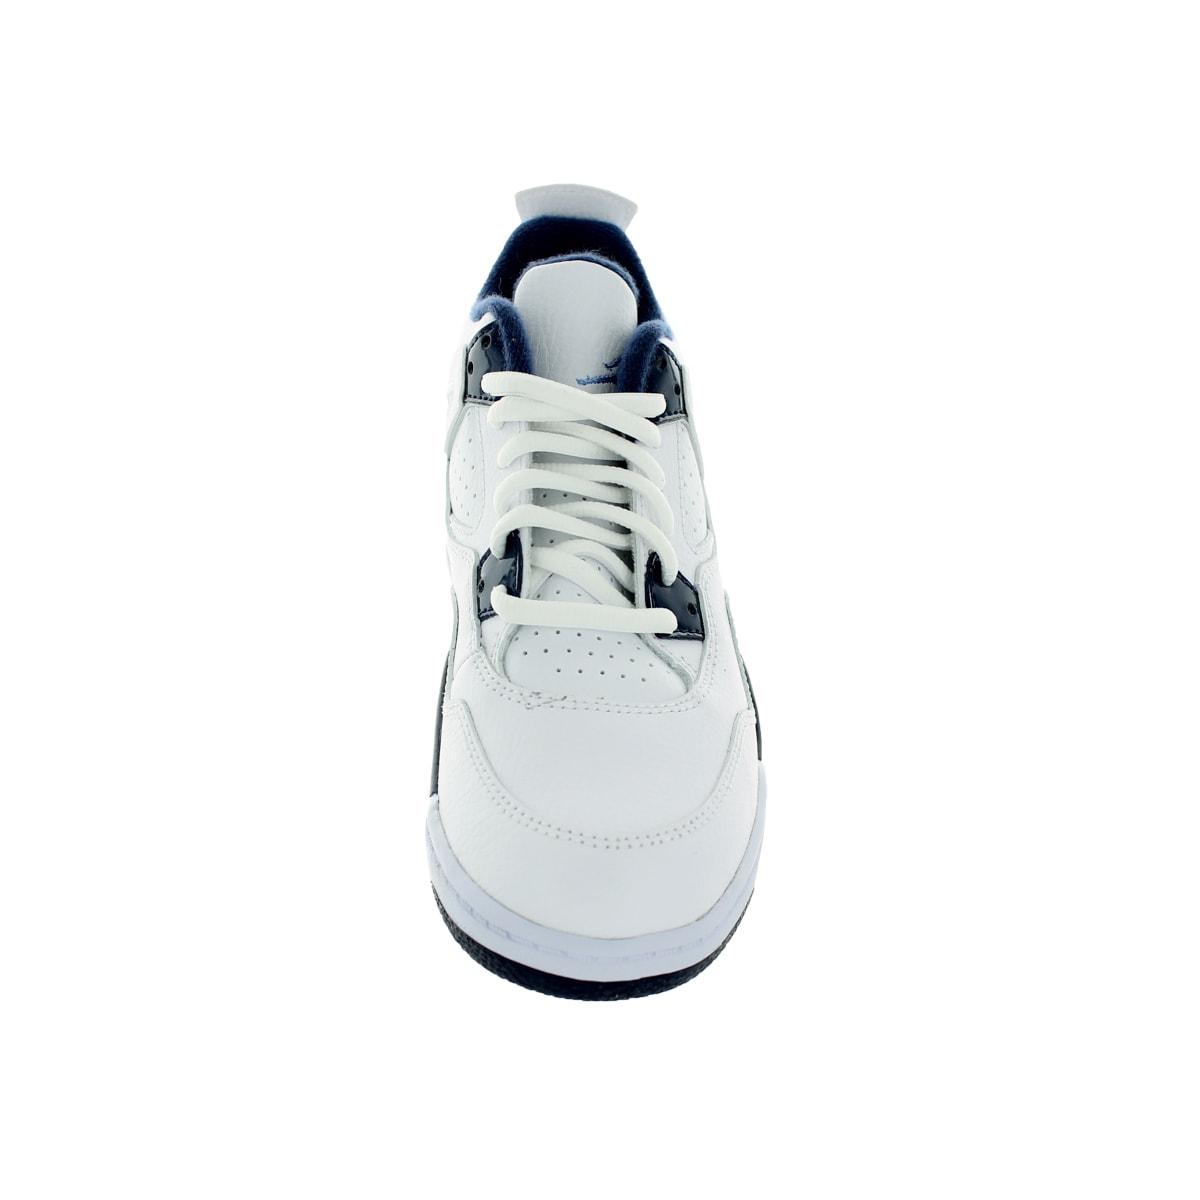 a3de3baa0b0e Shop Nike Jordan Kid s Jordan 4 Retro Ls Bp White Legend Blue Mdnght Navy  Basketball Shoe - Free Shipping Today - Overstock - 12322158